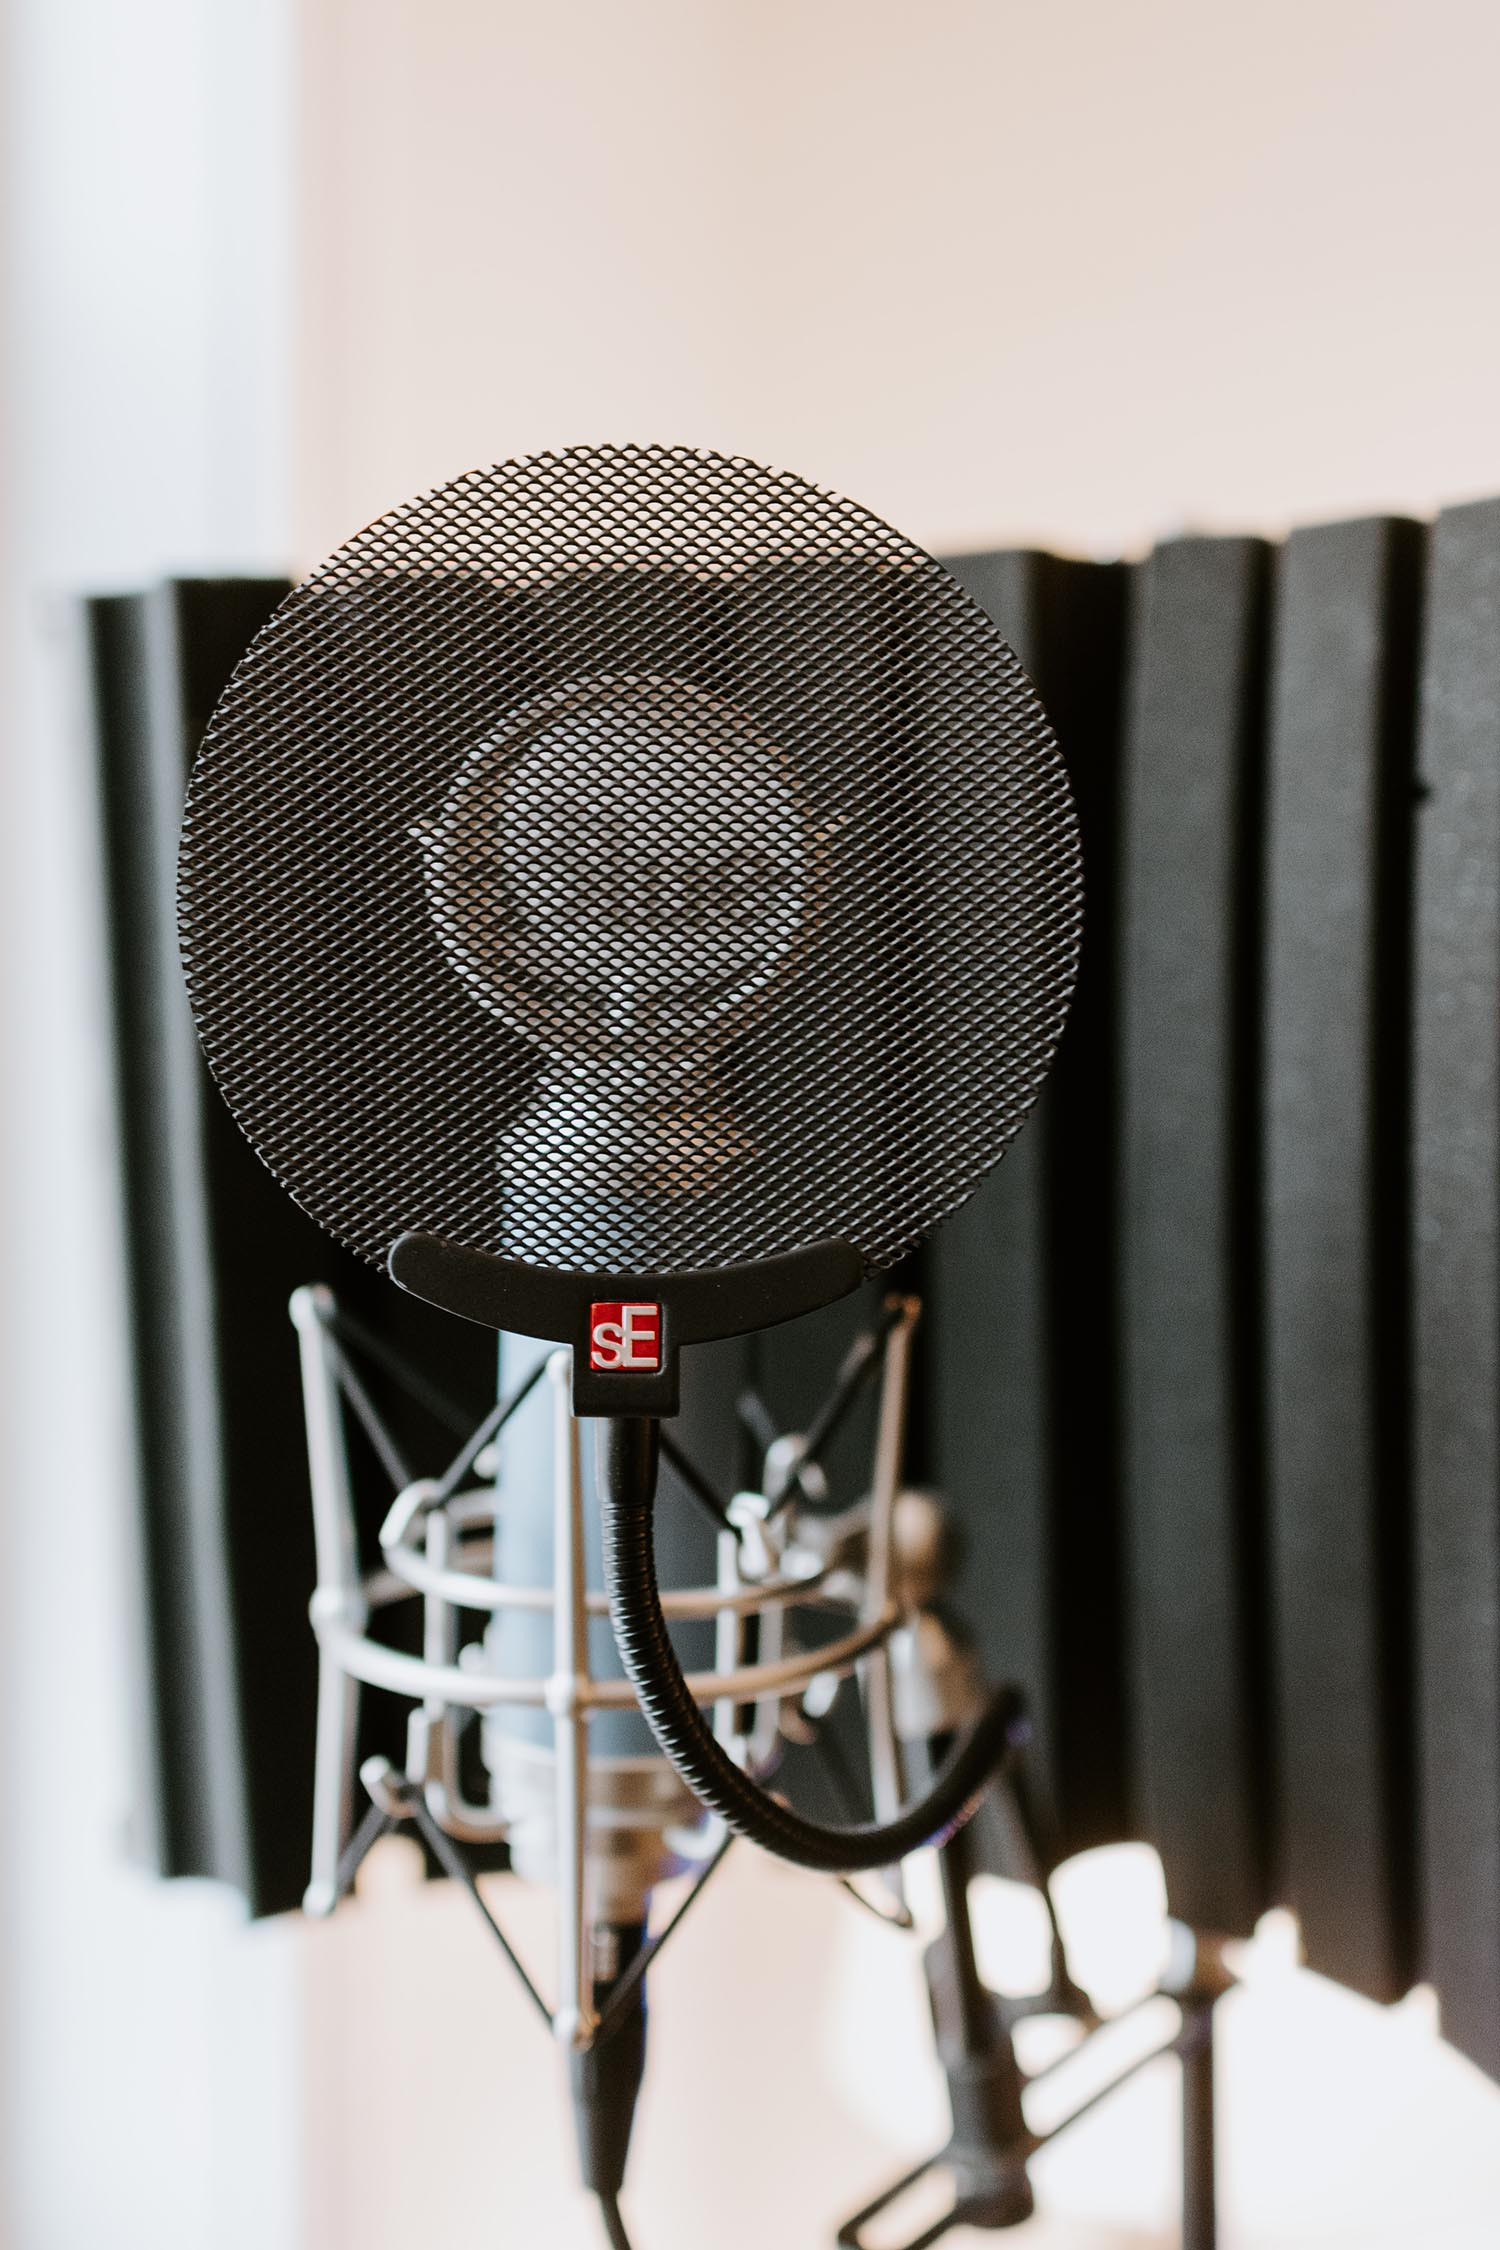 Abbildung eines Radiomikrofons